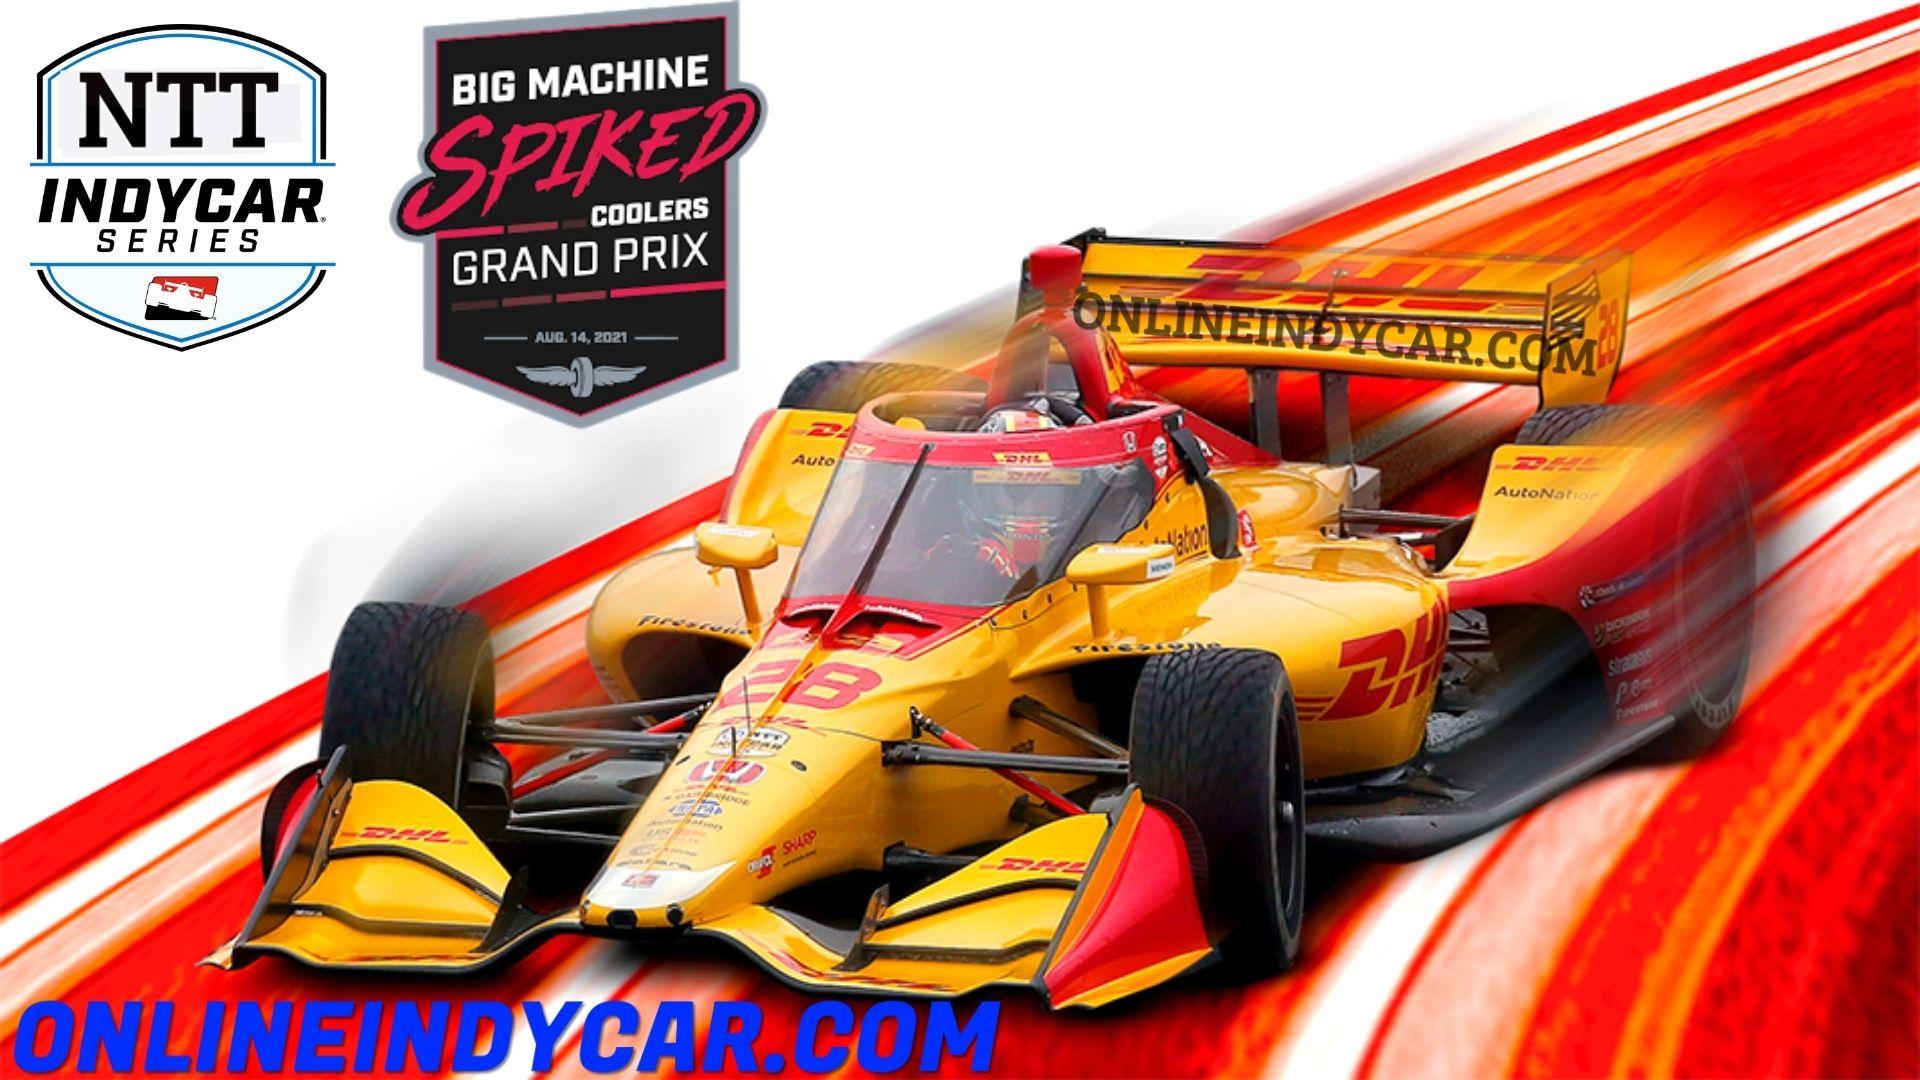 IndyCar Grand Prix at IMS Live Stream